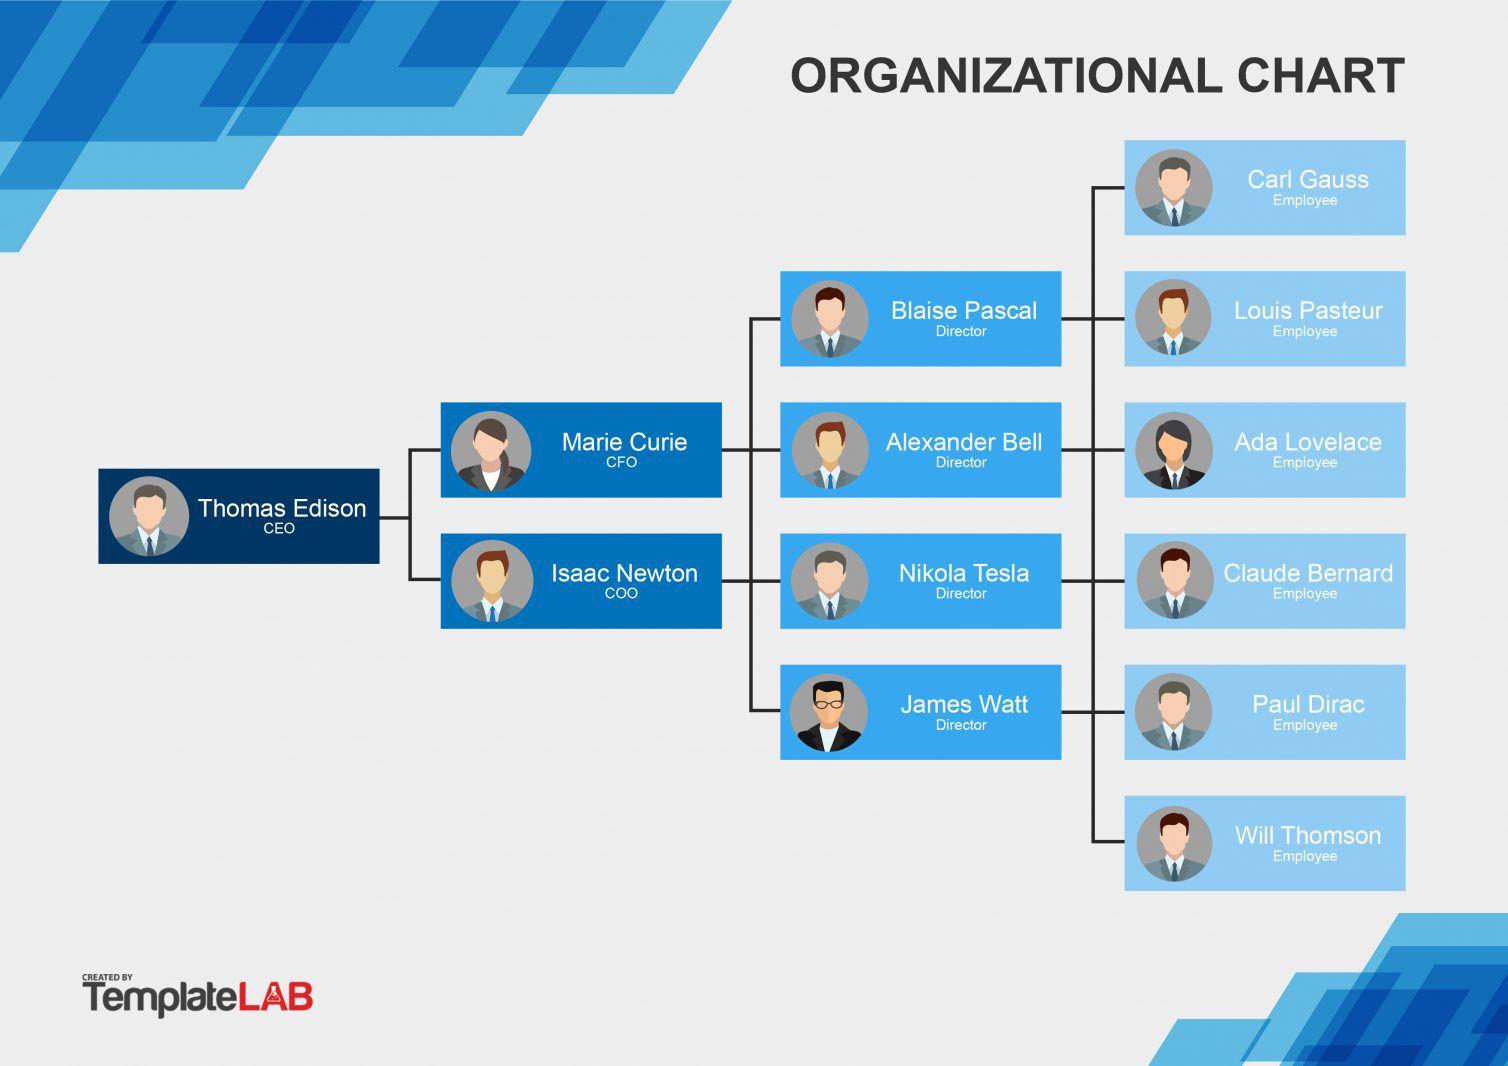 010 Unforgettable Microsoft Word Organization Chart Template High Definition  Organizational Download 2007Full